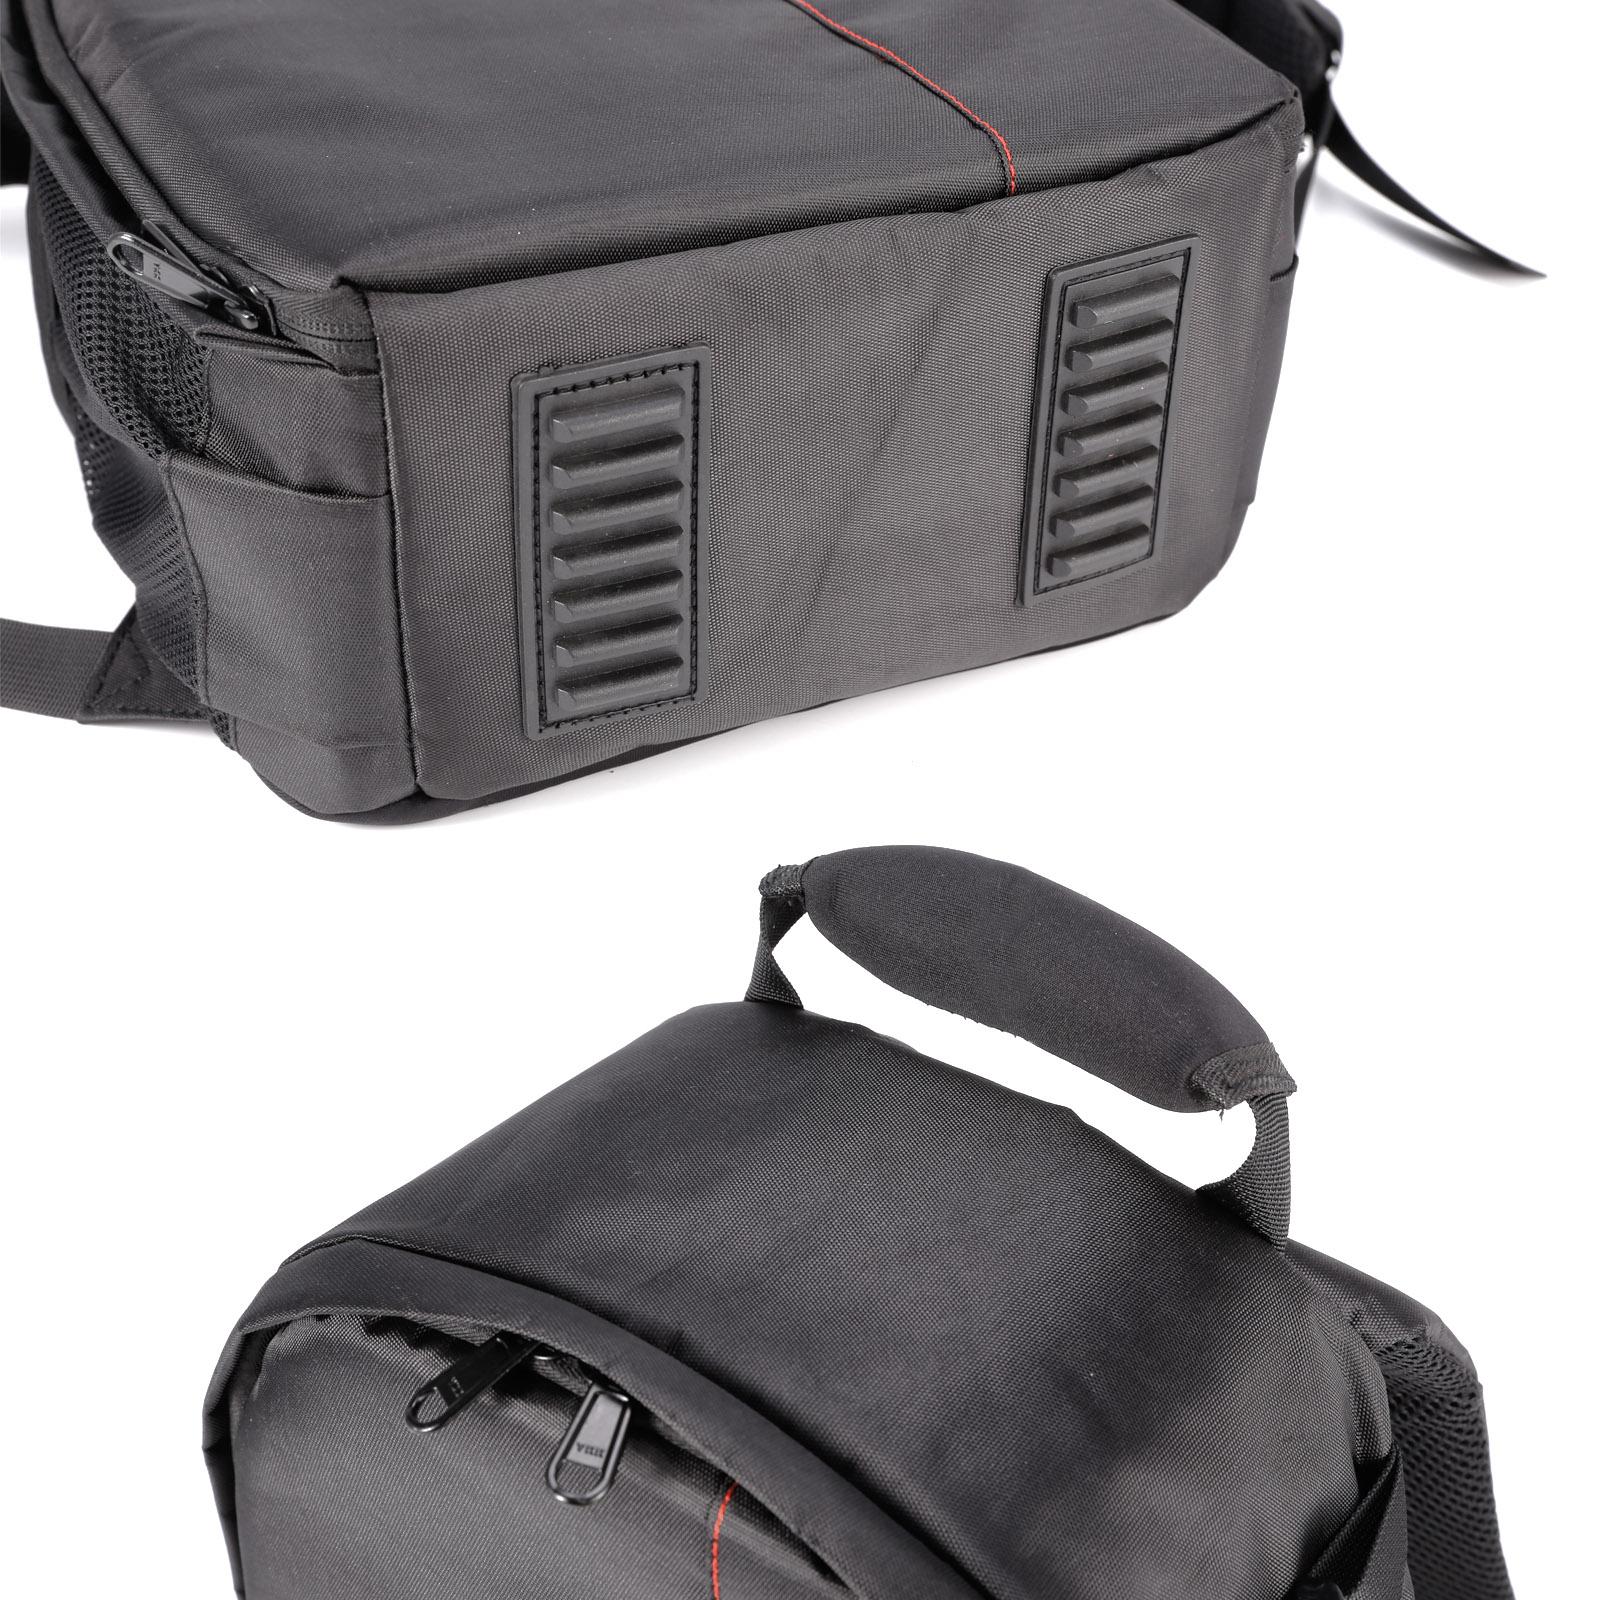 sac appareil photo reflex num rique dos sacs tanche dslr canon nikon sony ebay. Black Bedroom Furniture Sets. Home Design Ideas